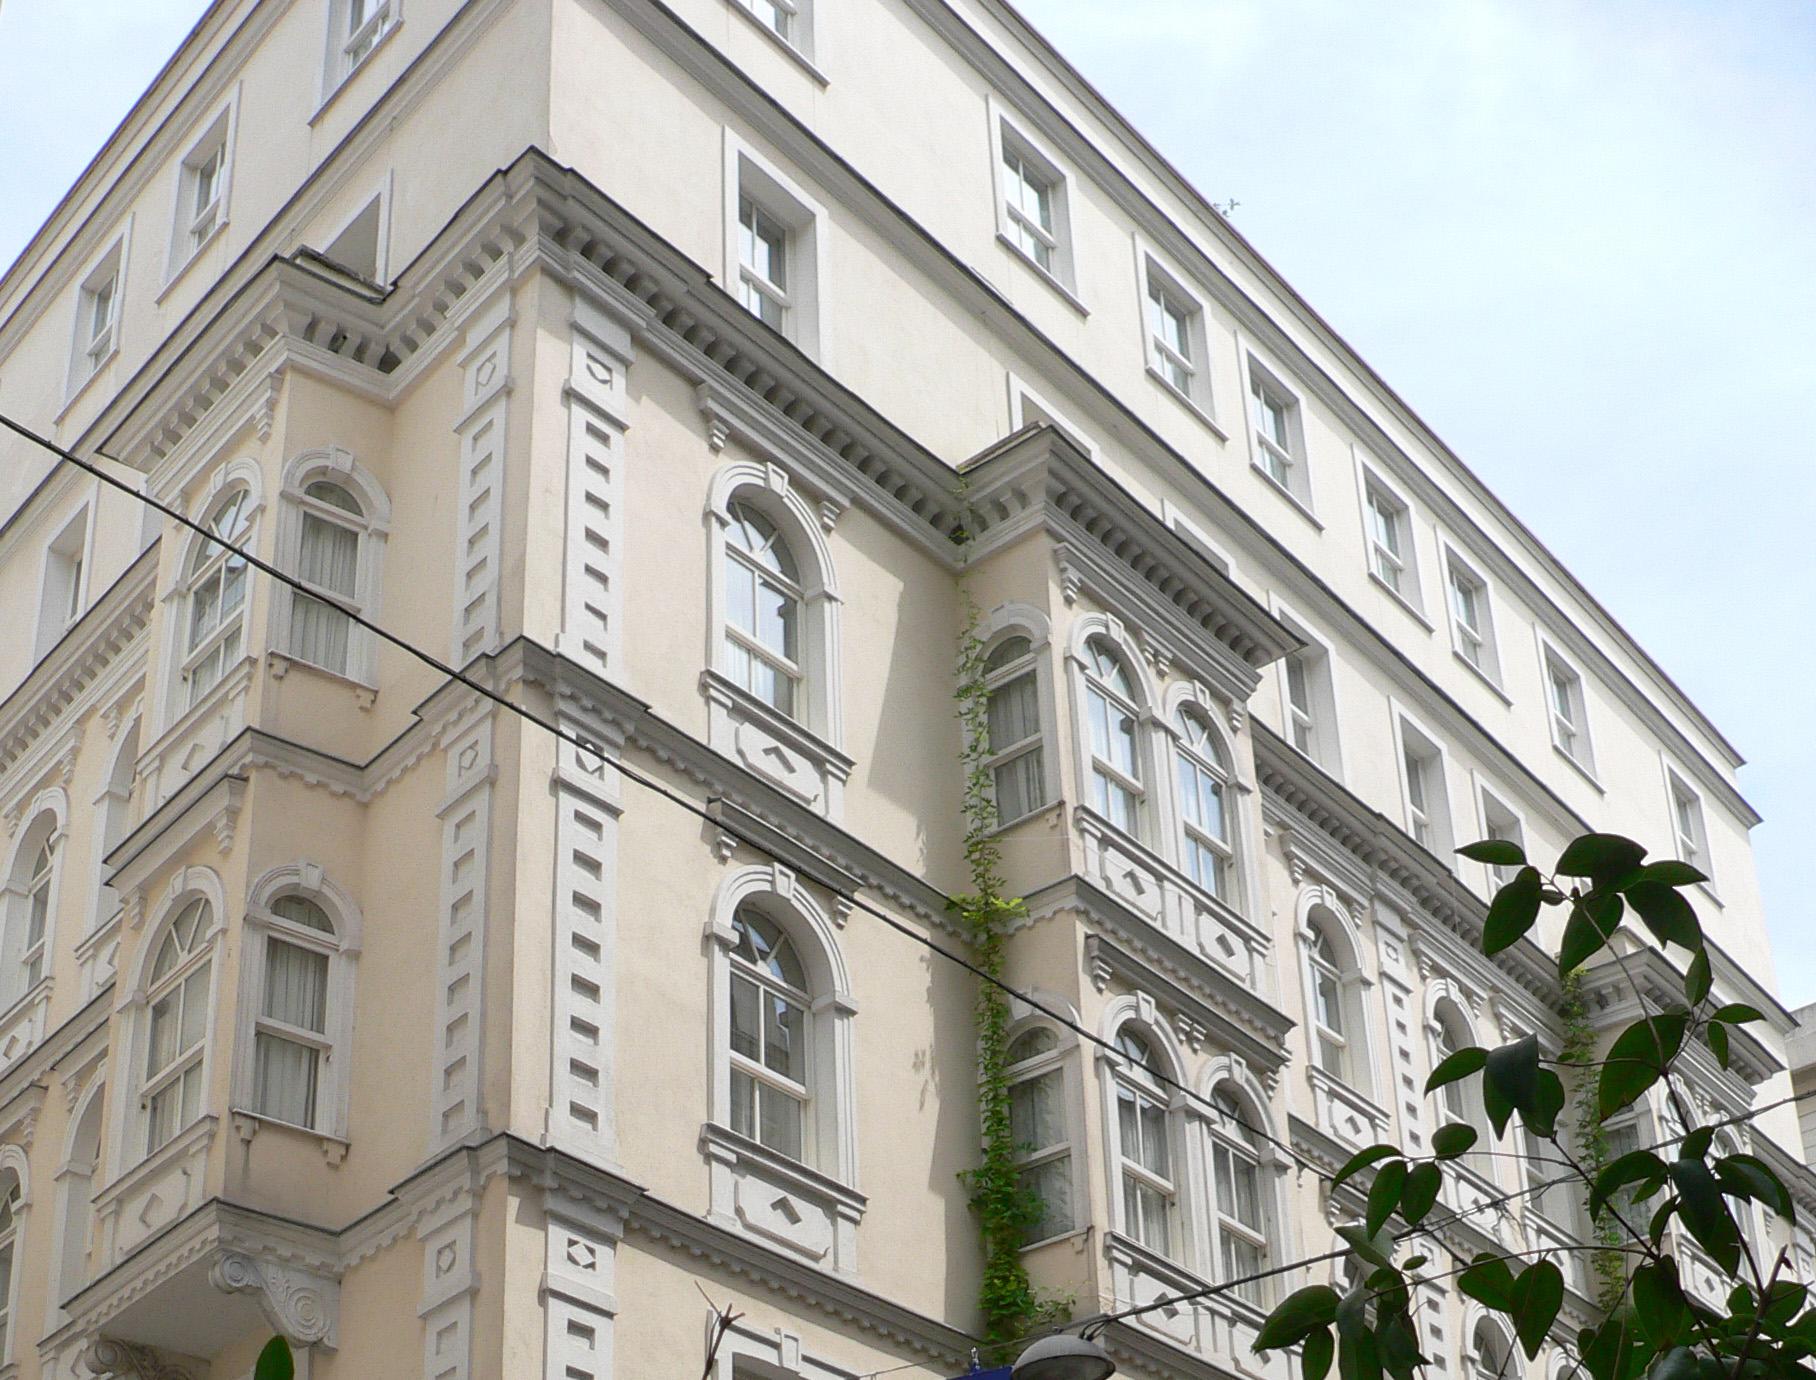 *Adahan Hotel Istanbul*